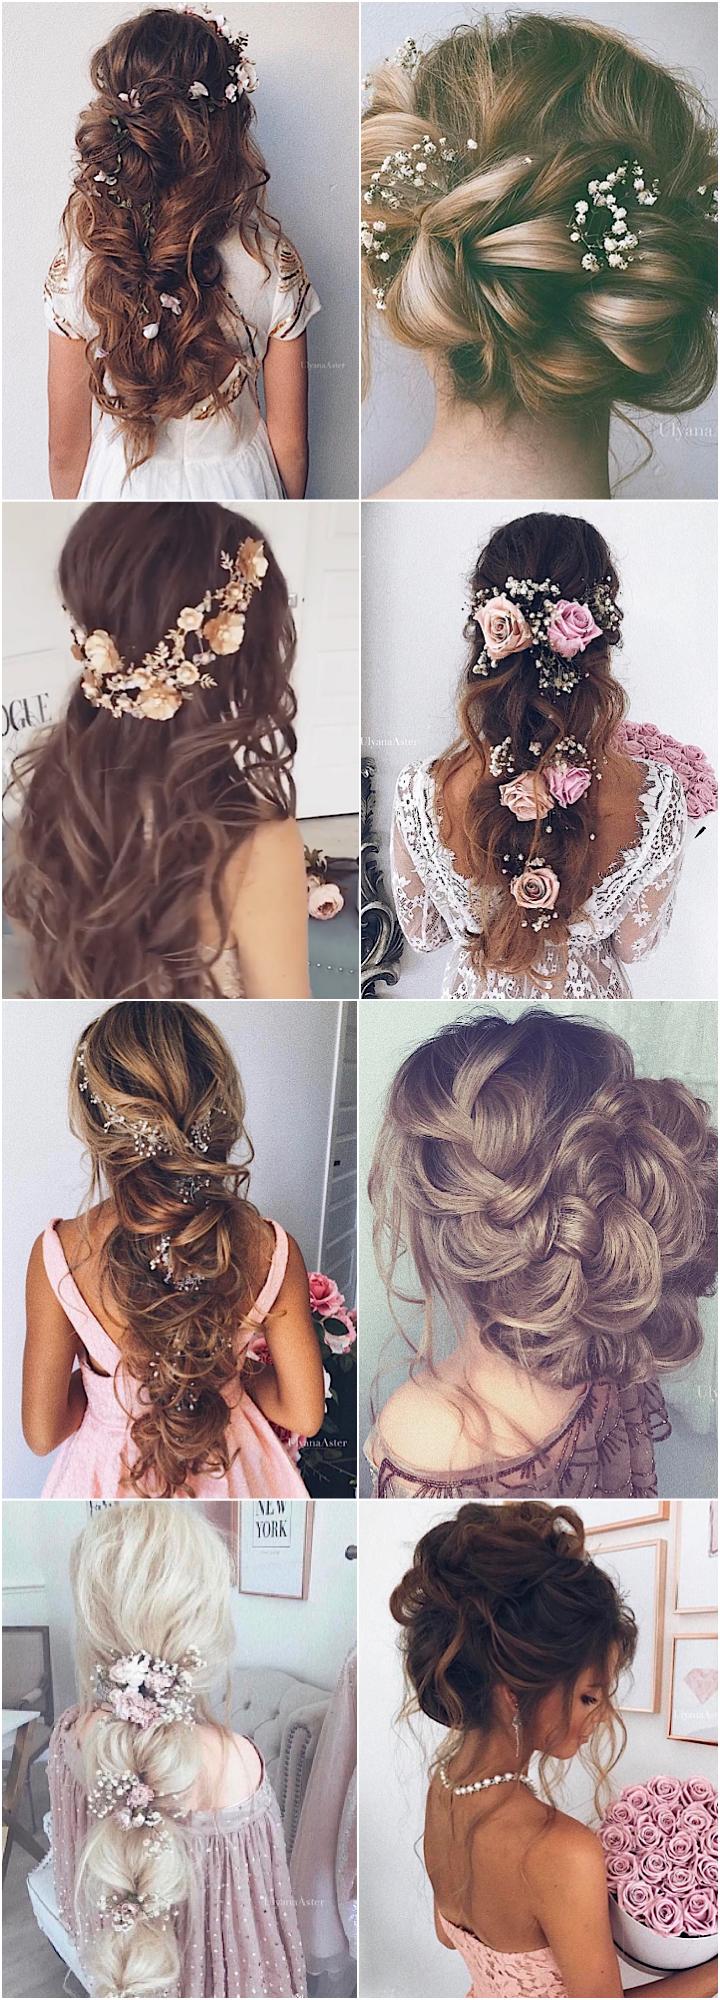 Wedding Hairstyle Inspiration Ulyana Aster Hair style Wedding